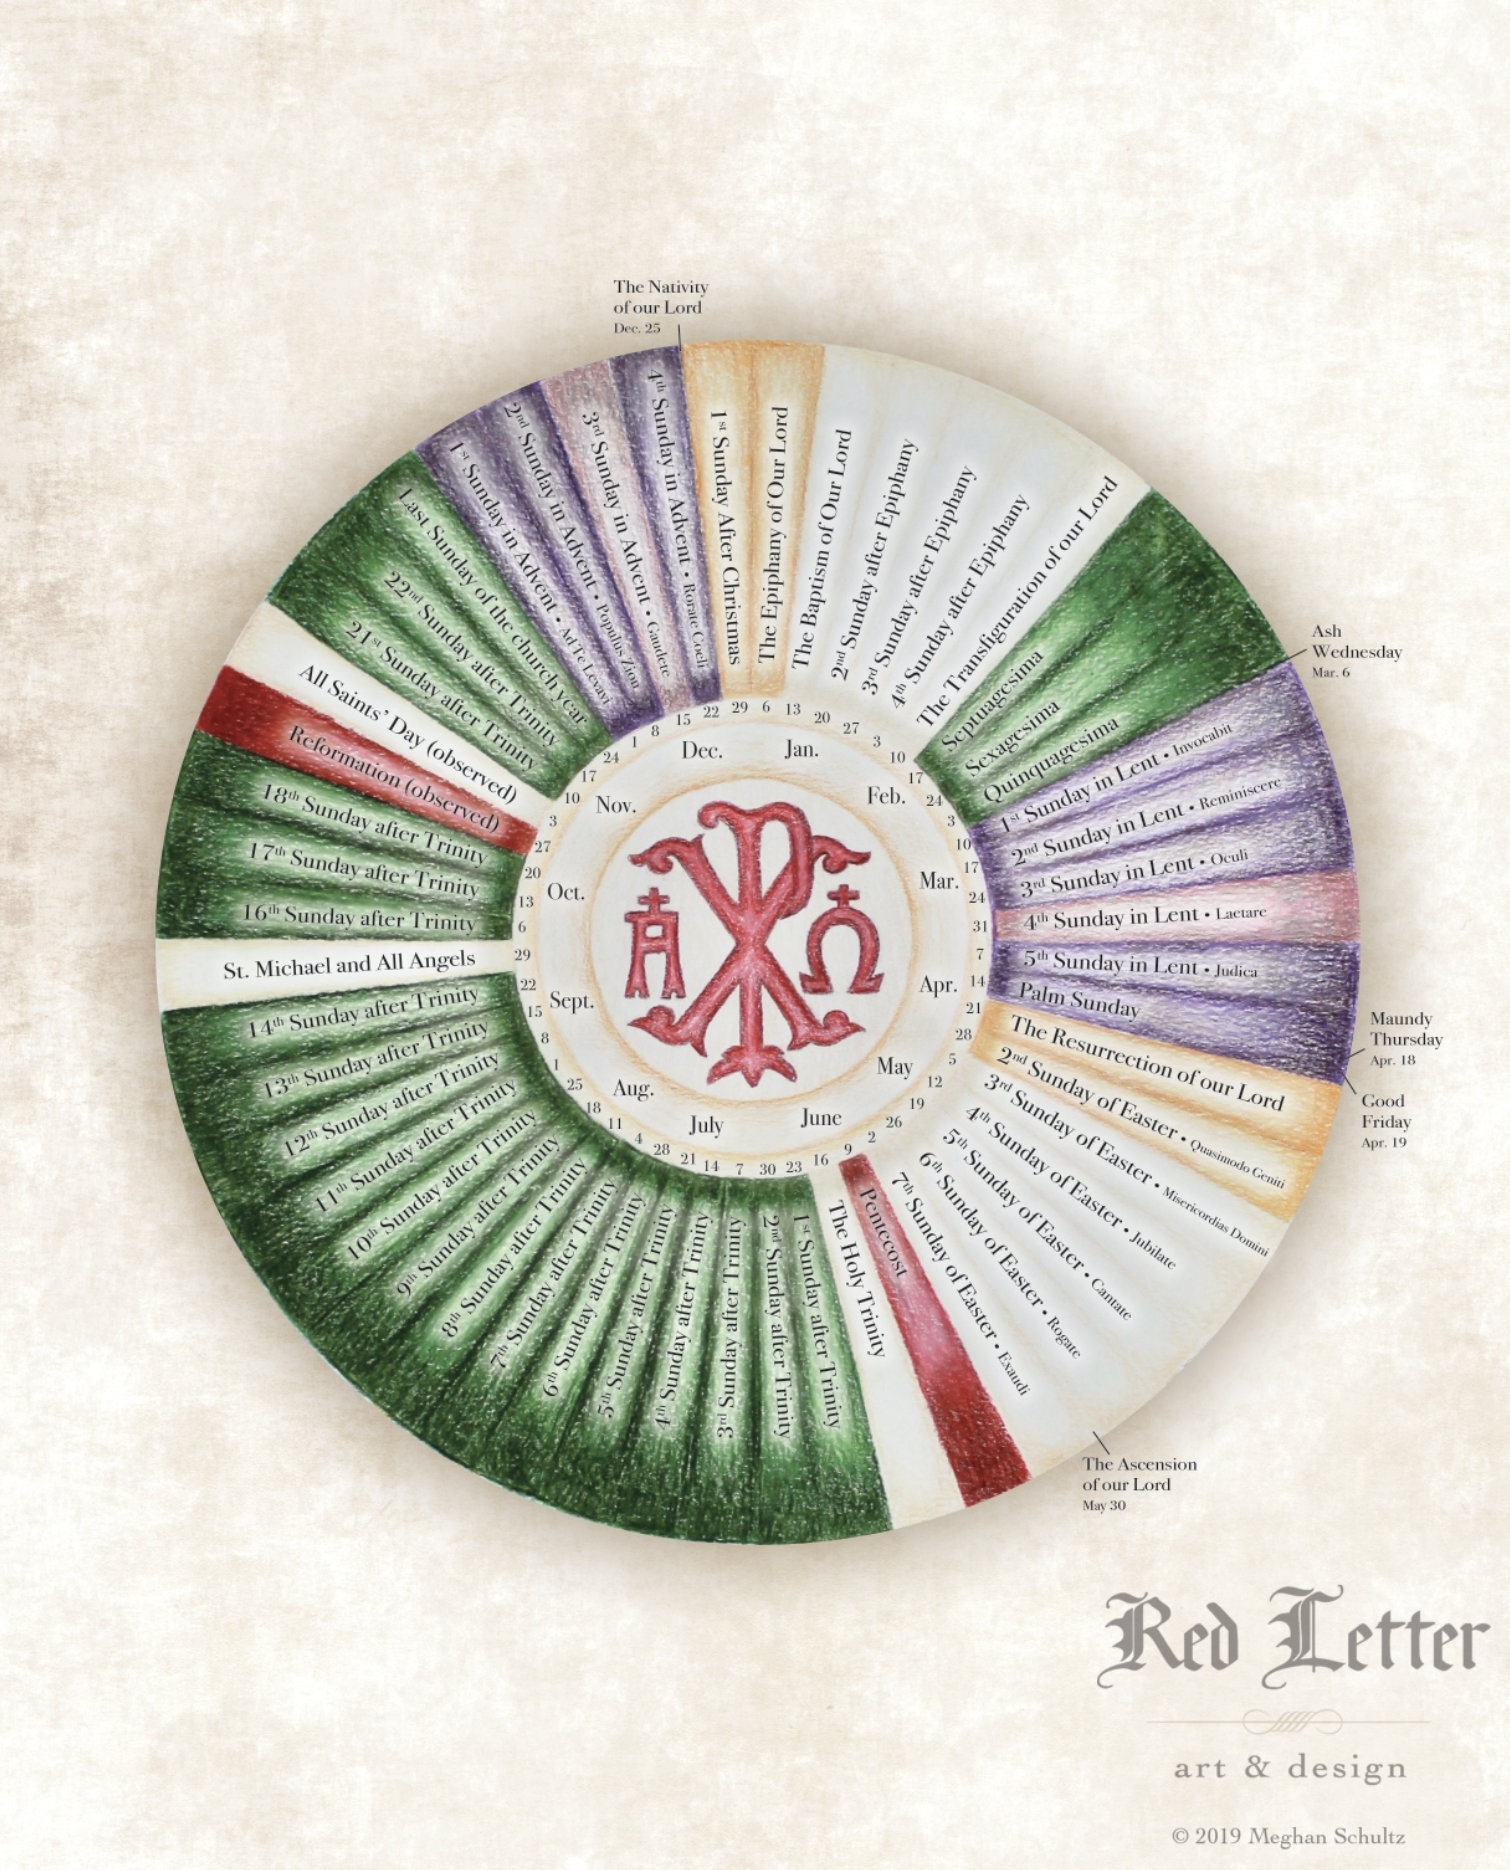 One Year Lectionary Liturgical Calendar | Etsy intended for Liturgical Calendar In Sri Lanka